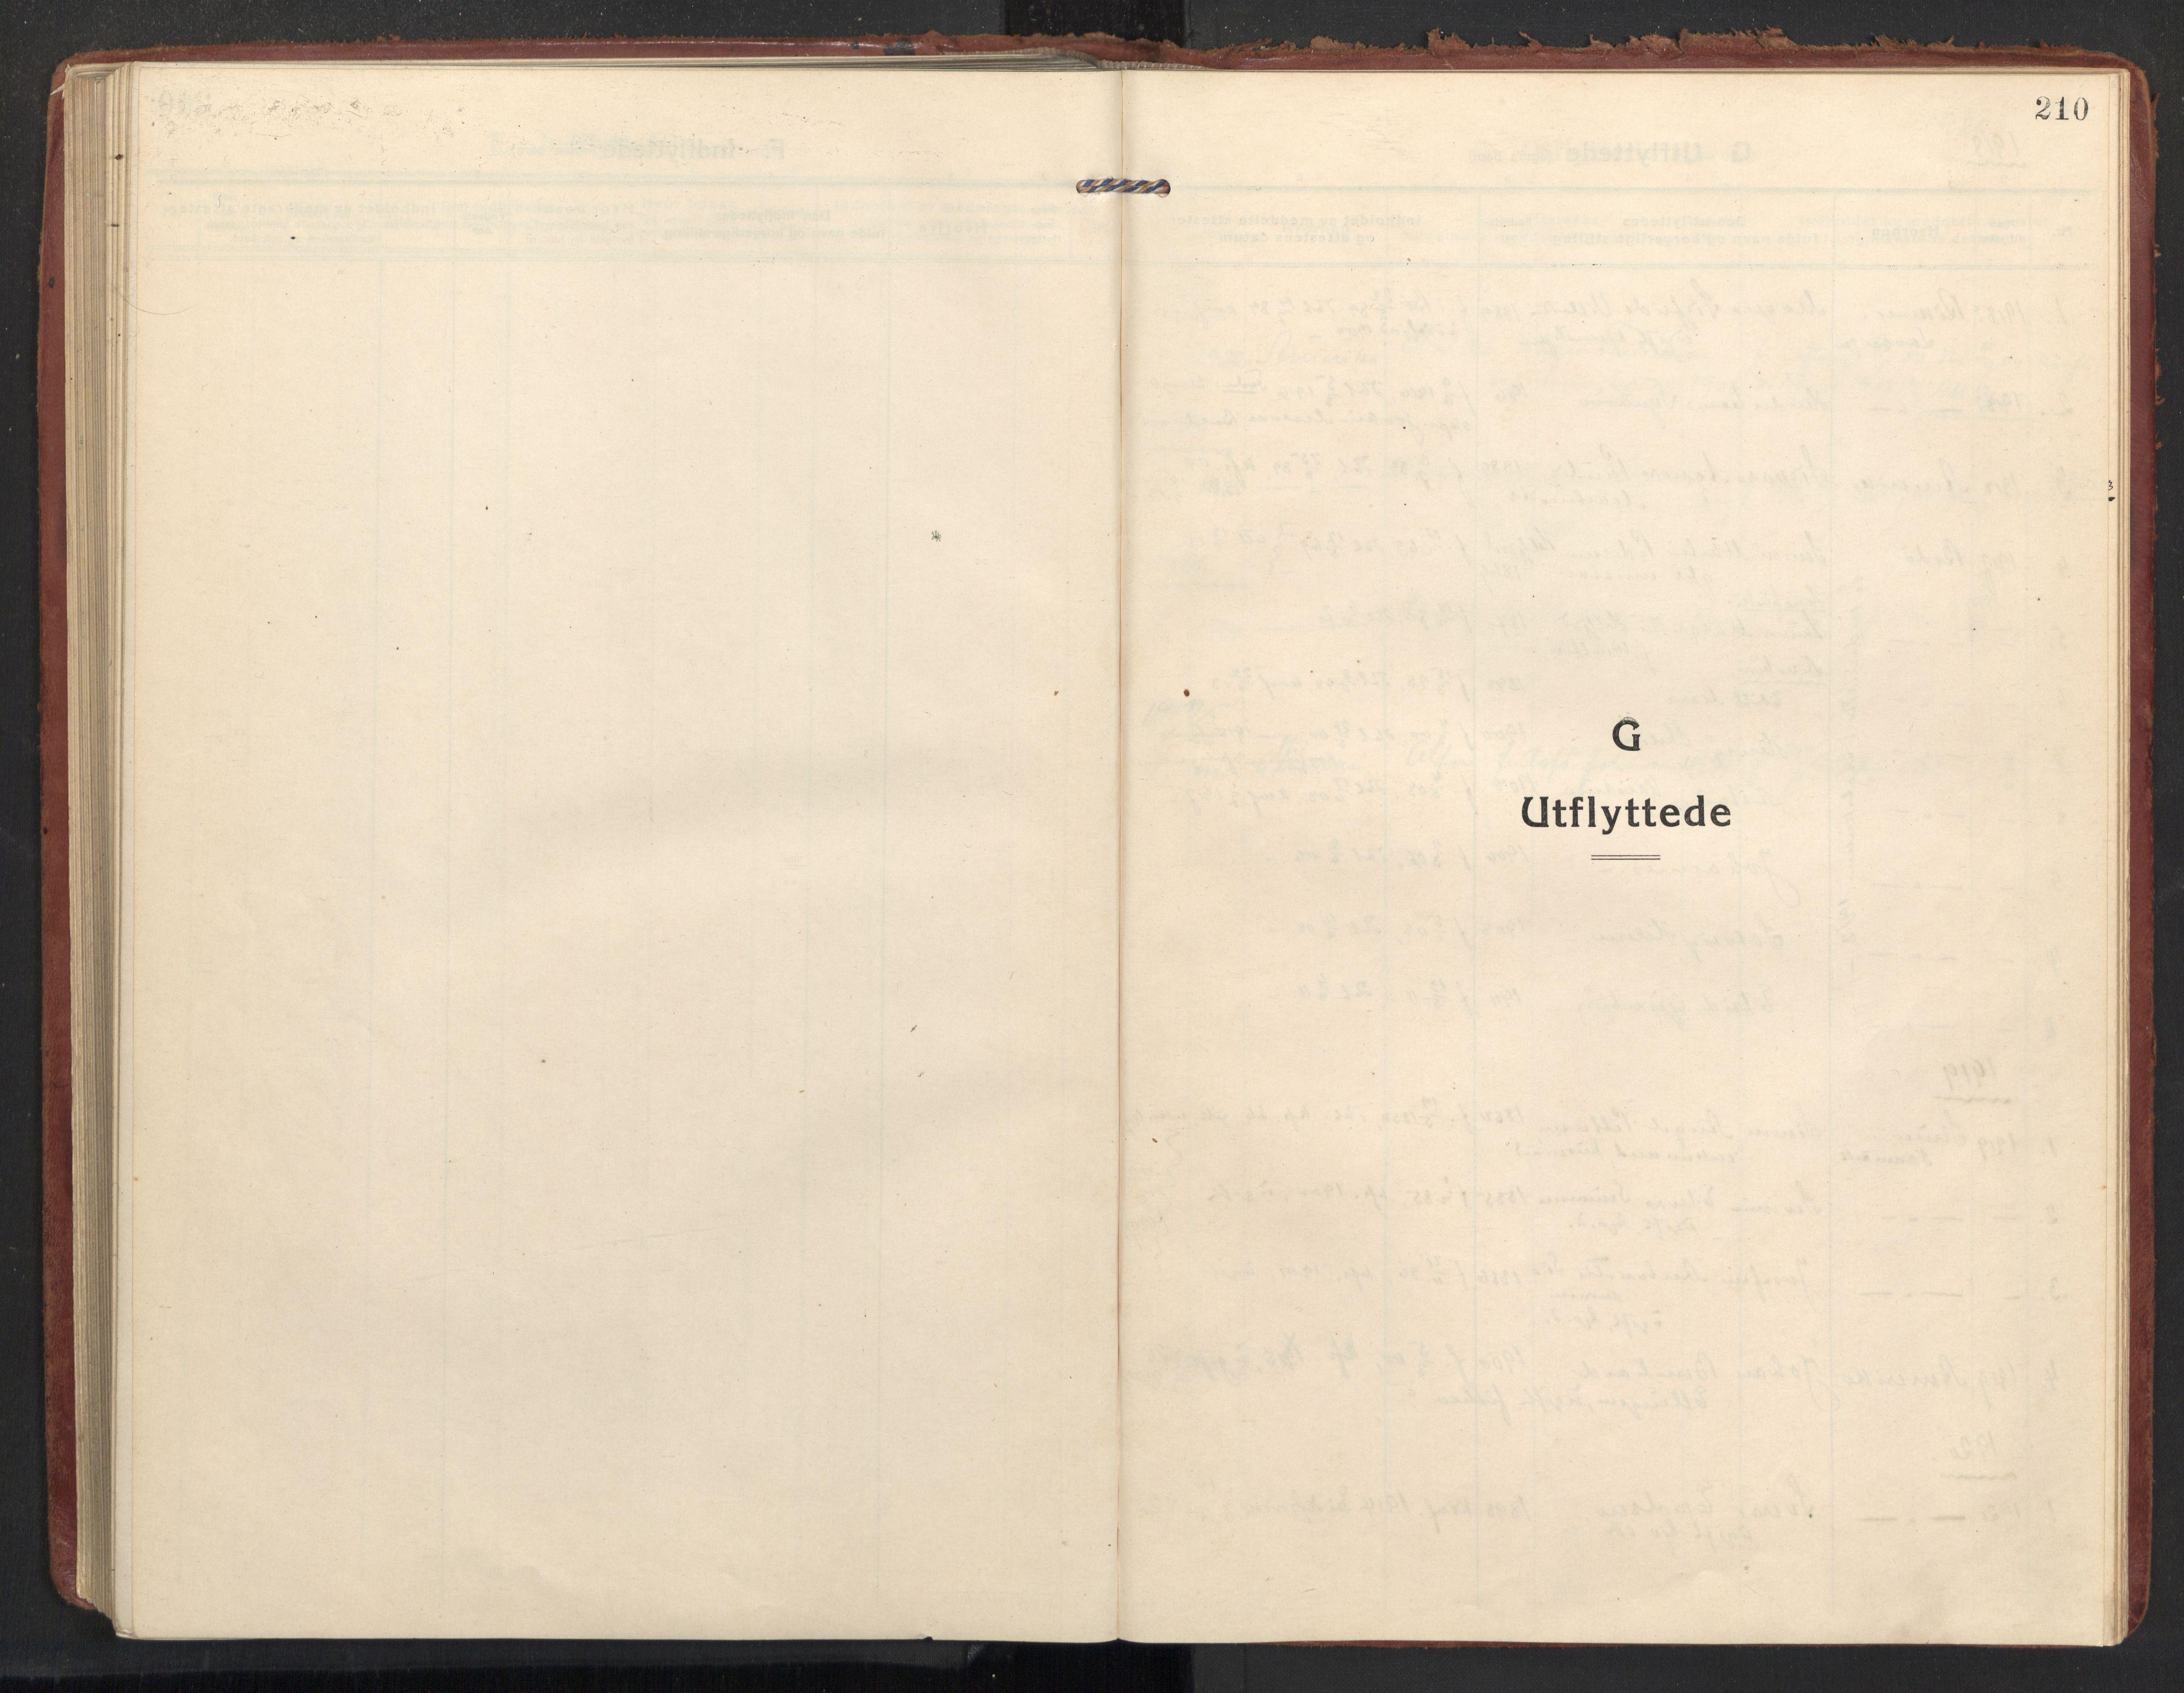 SAT, Ministerialprotokoller, klokkerbøker og fødselsregistre - Nordland, 890/L1288: Ministerialbok nr. 890A03, 1915-1925, s. 210